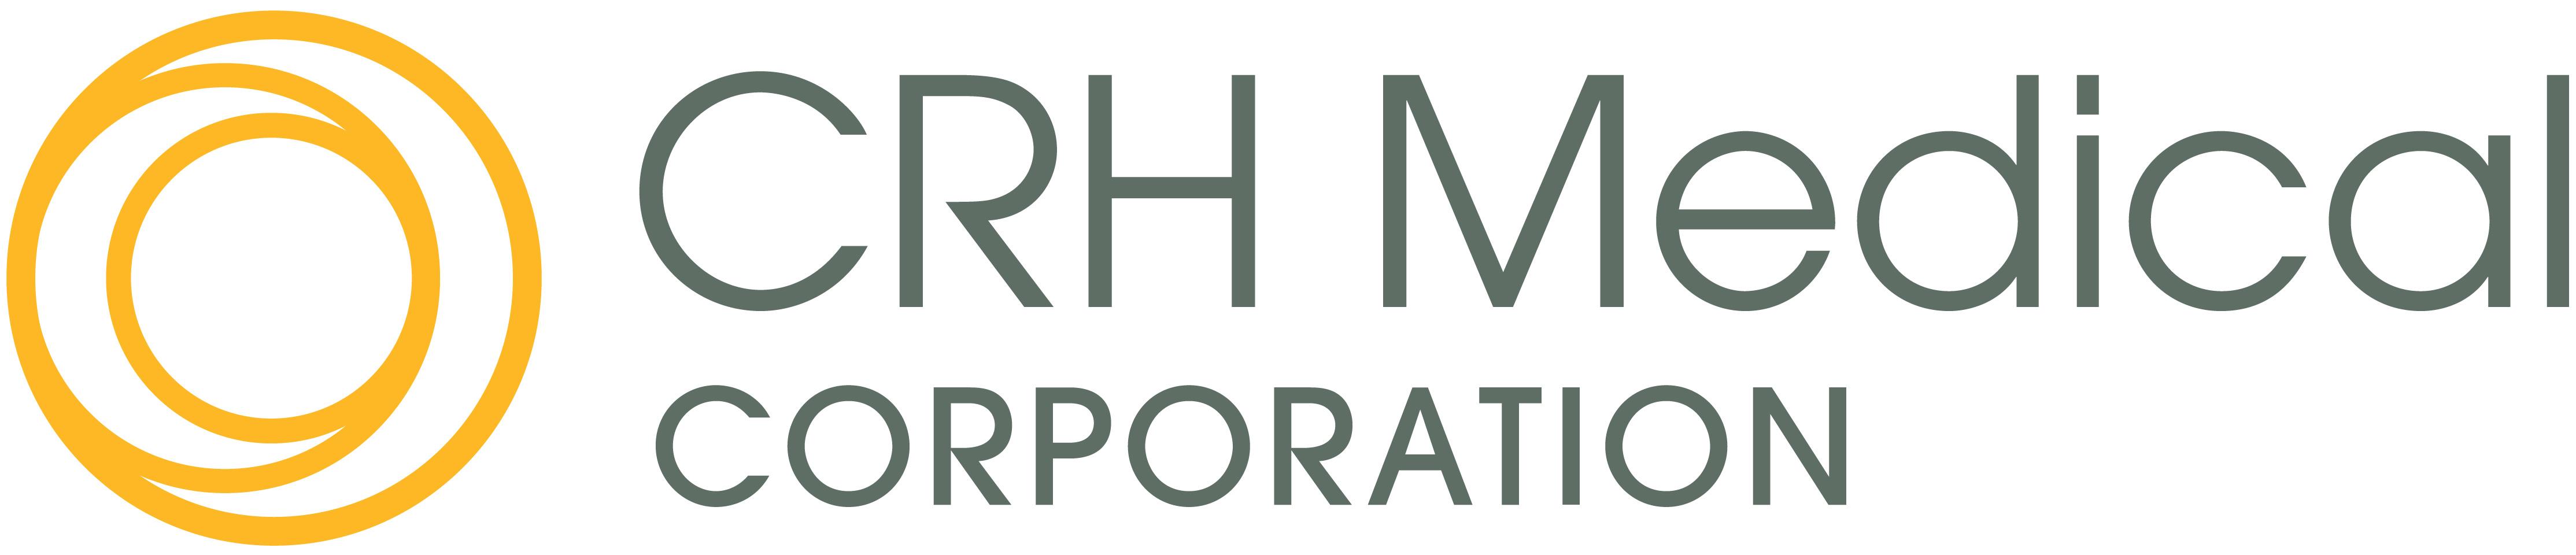 CRH Medical Corp logo